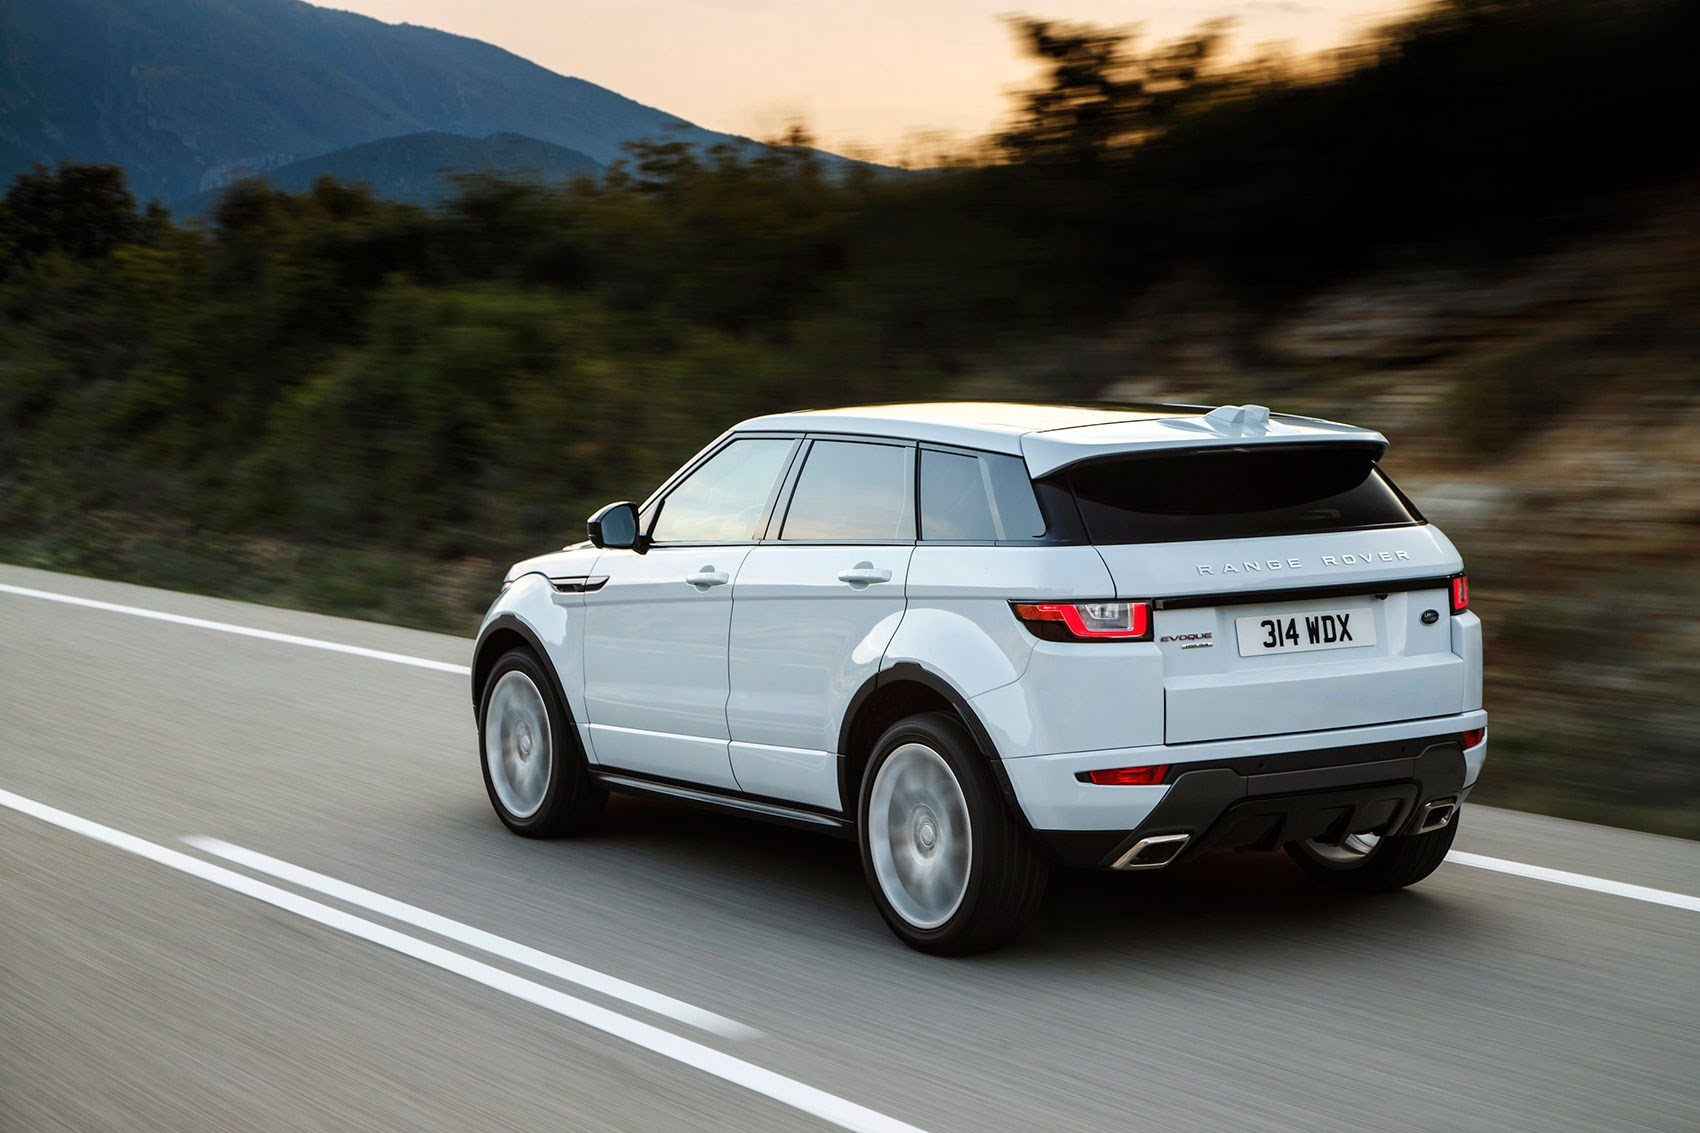 Land Rover Discovery Sport Range Rover Evoque 2018 Model